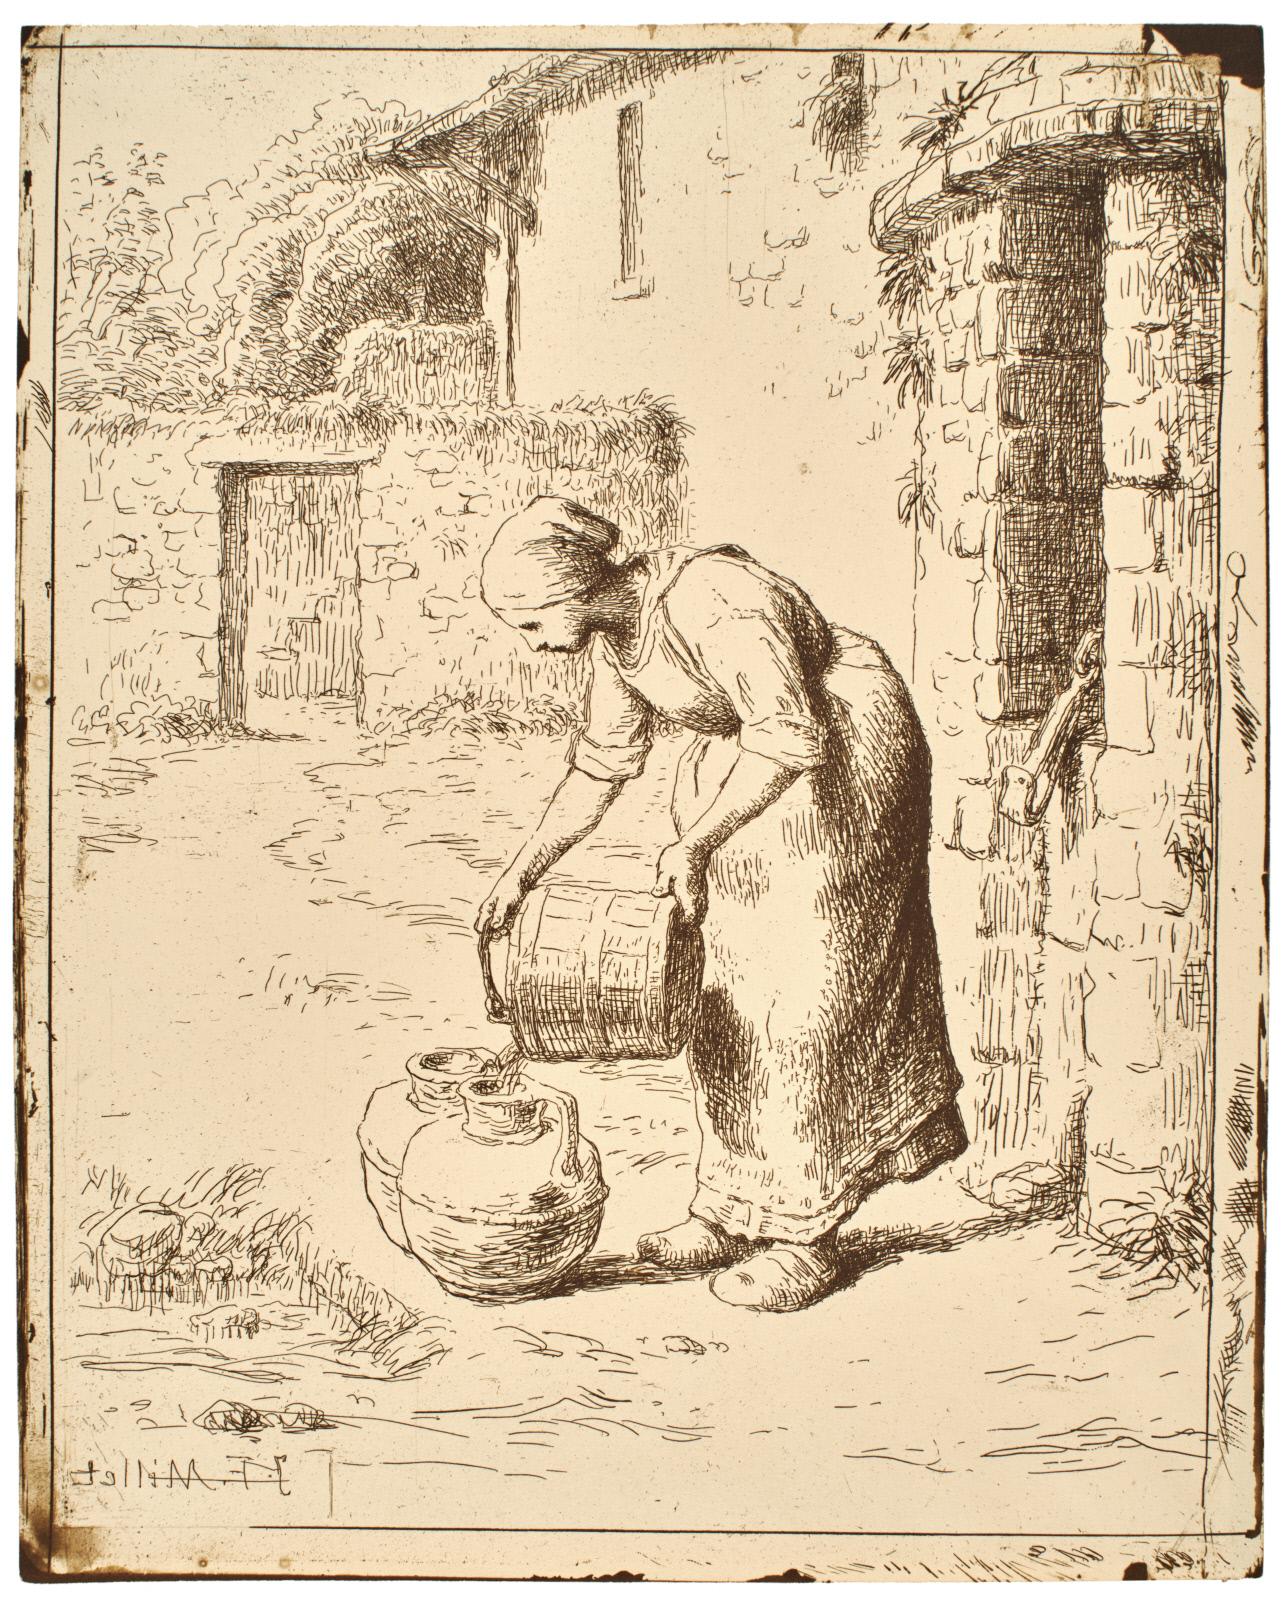 WOMAN EMPTYING A BUCKET (FEMME VIDANT UN SEAU)